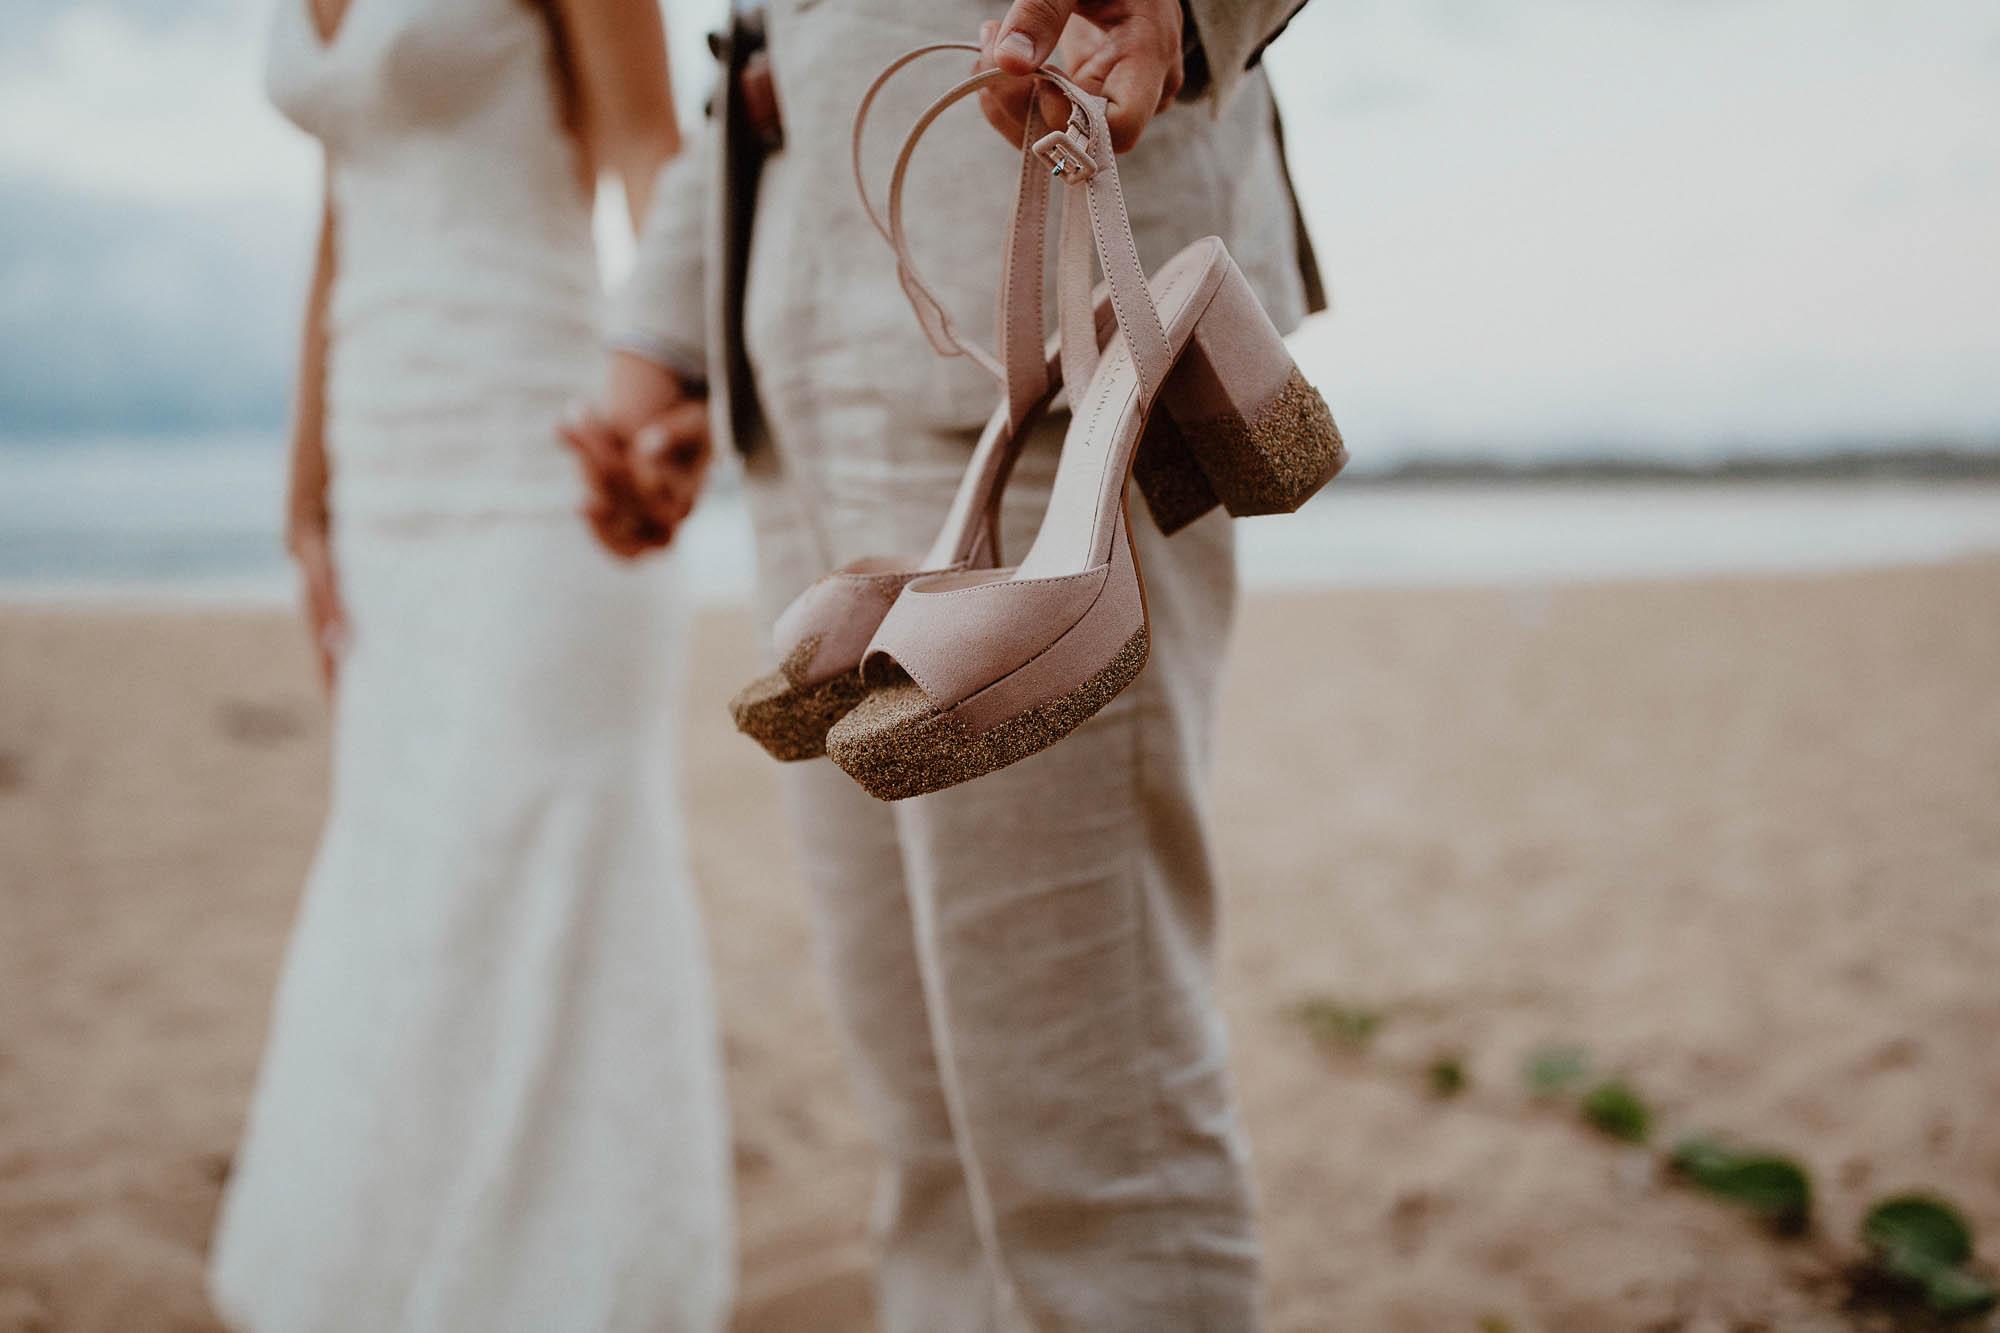 Blush wedding shoes on the beach hanalei bay wedding day kauai hawaii